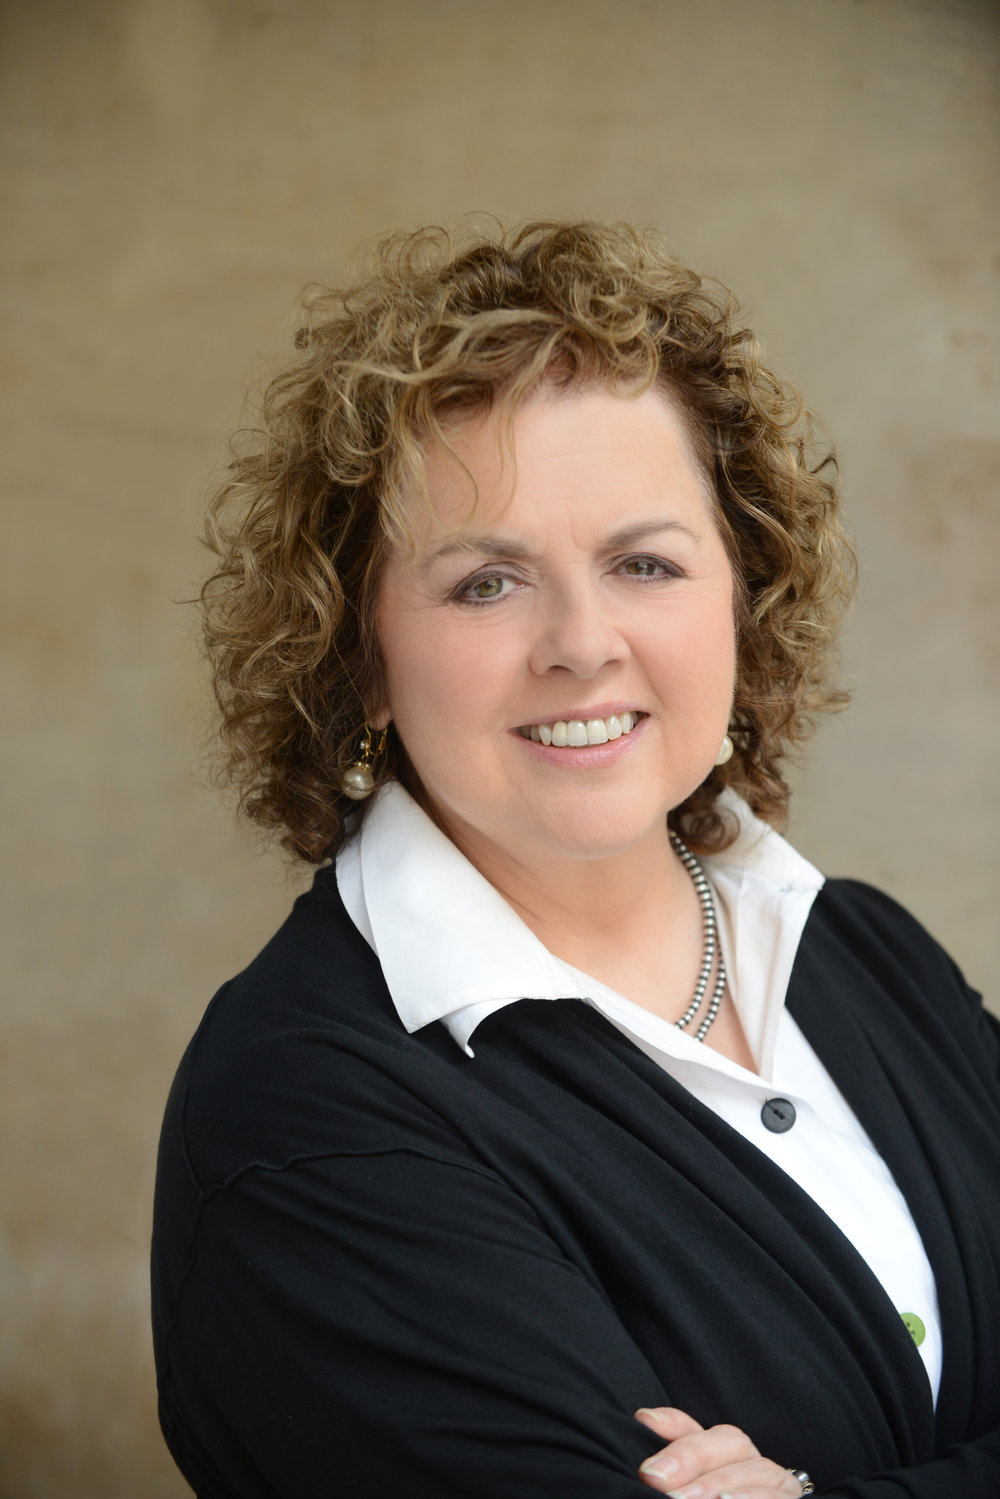 Laurie Garrett Headshot_General.JPG